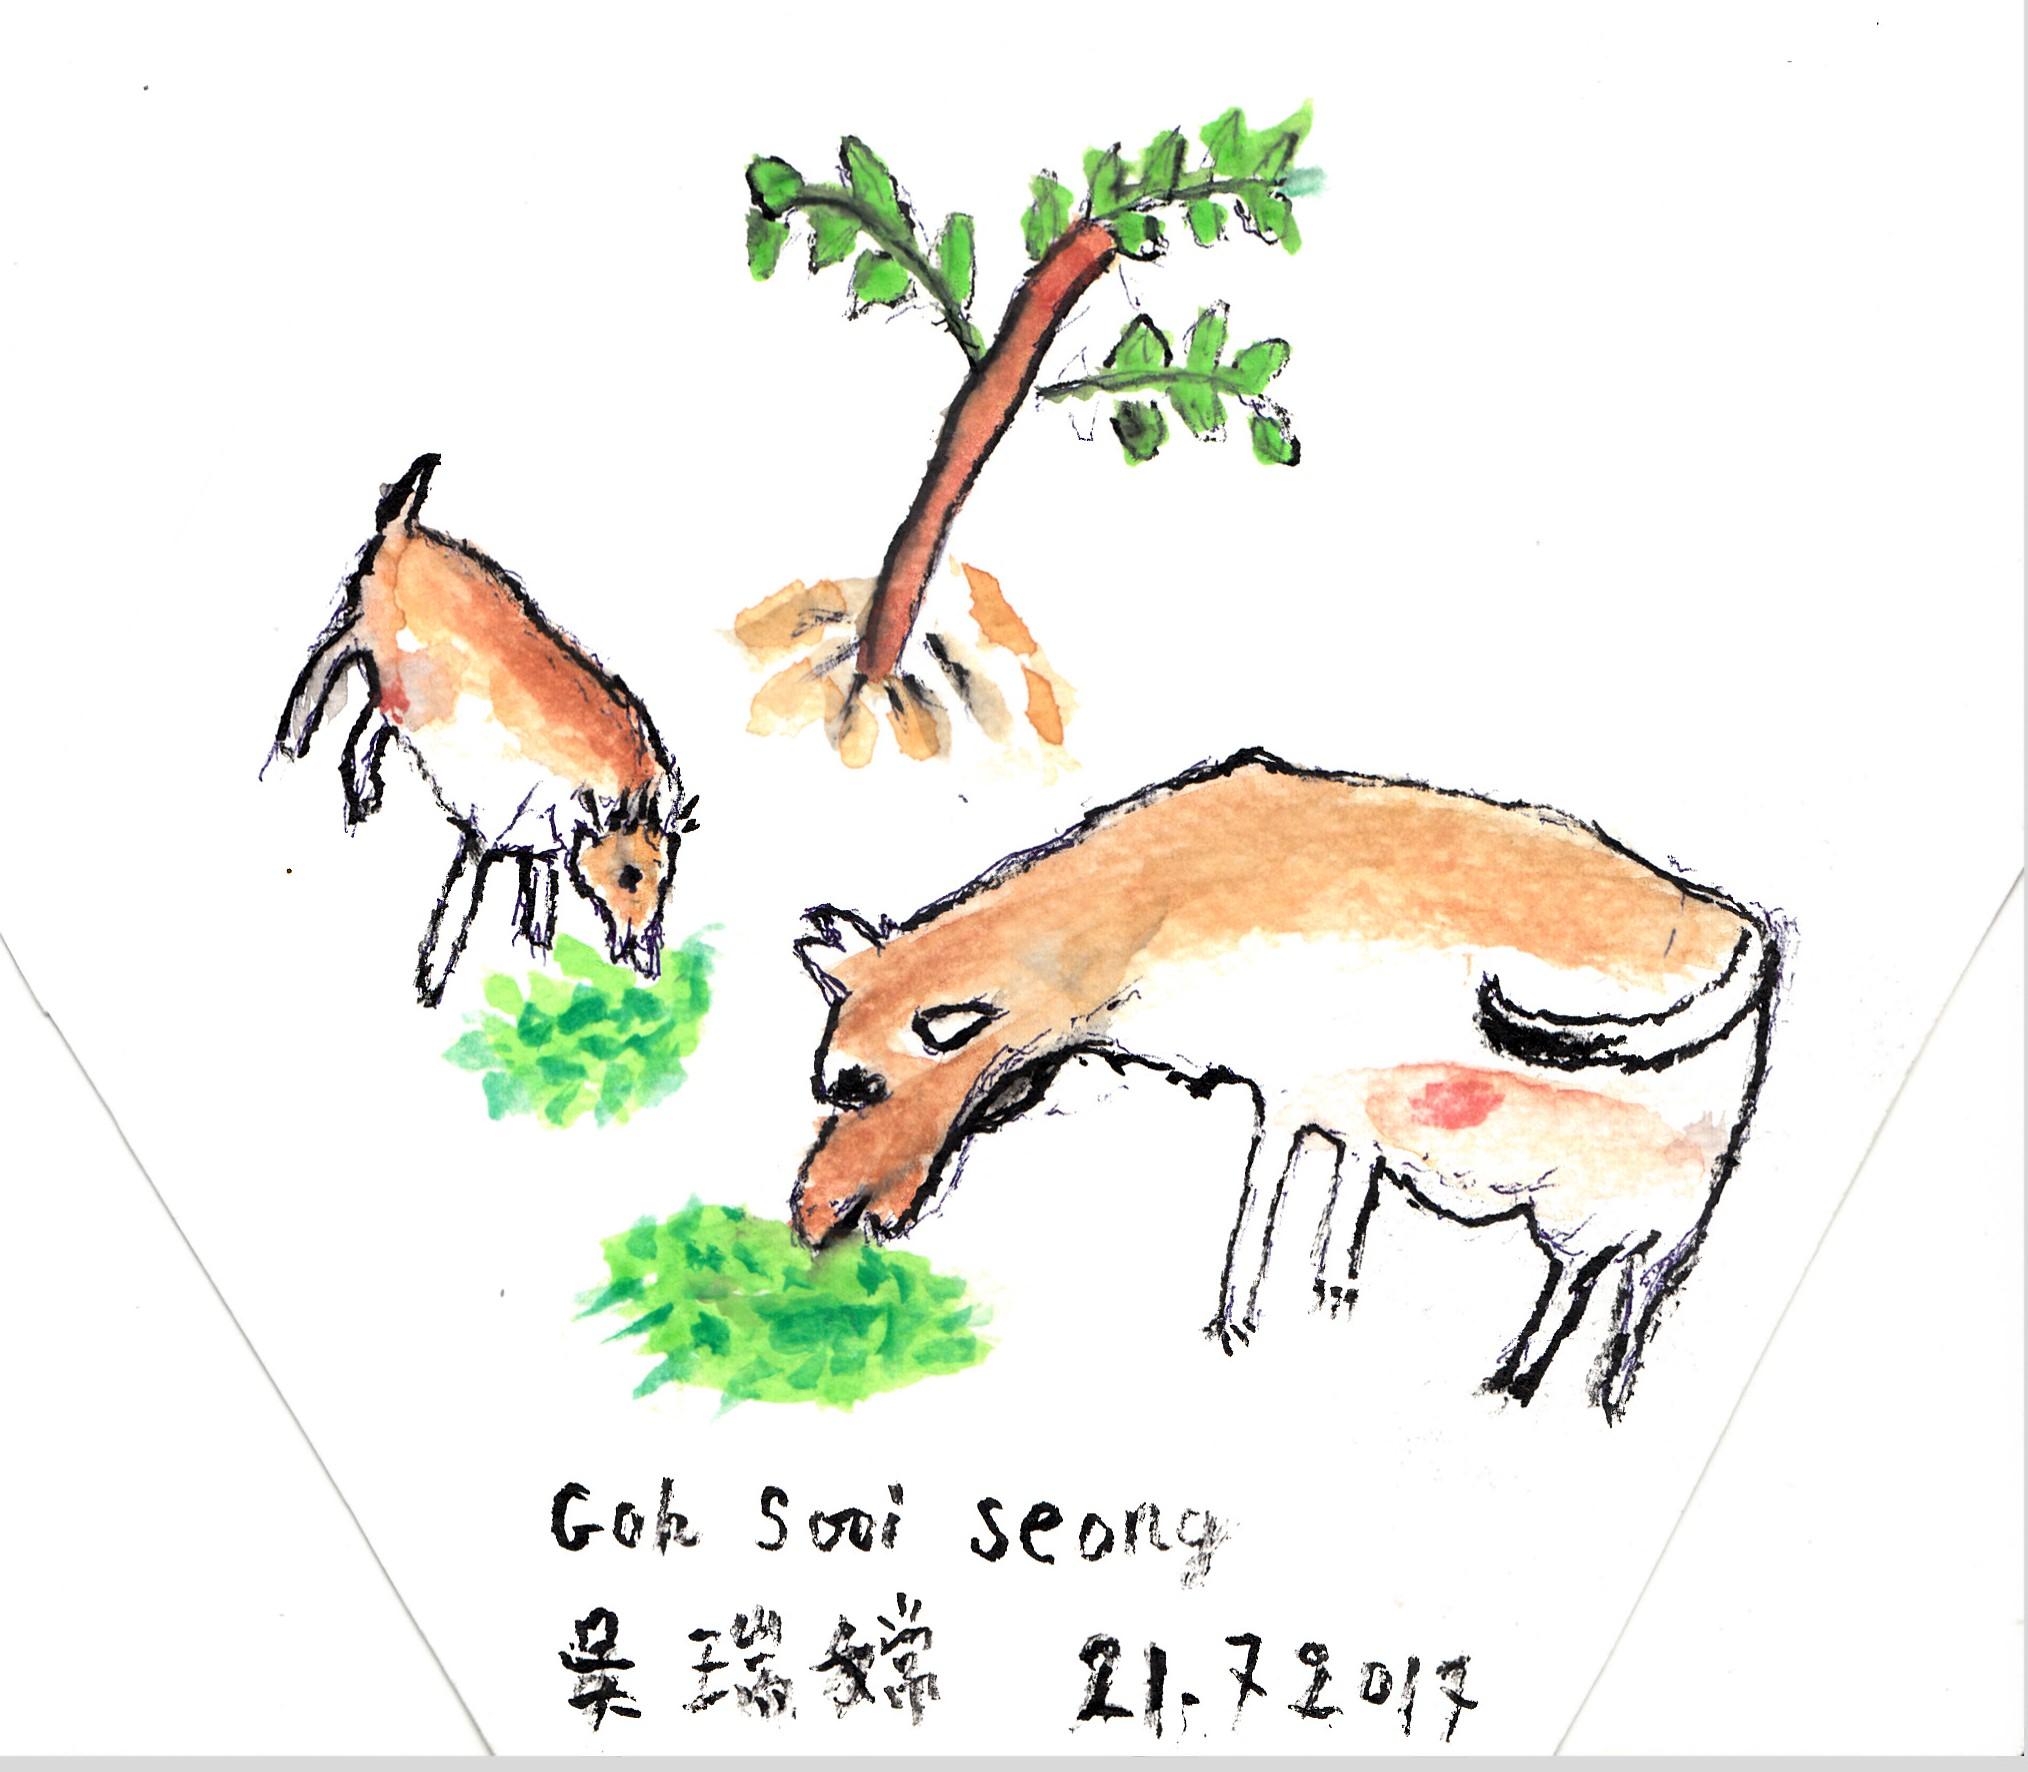 Goh Sooi Seong 5.jpg